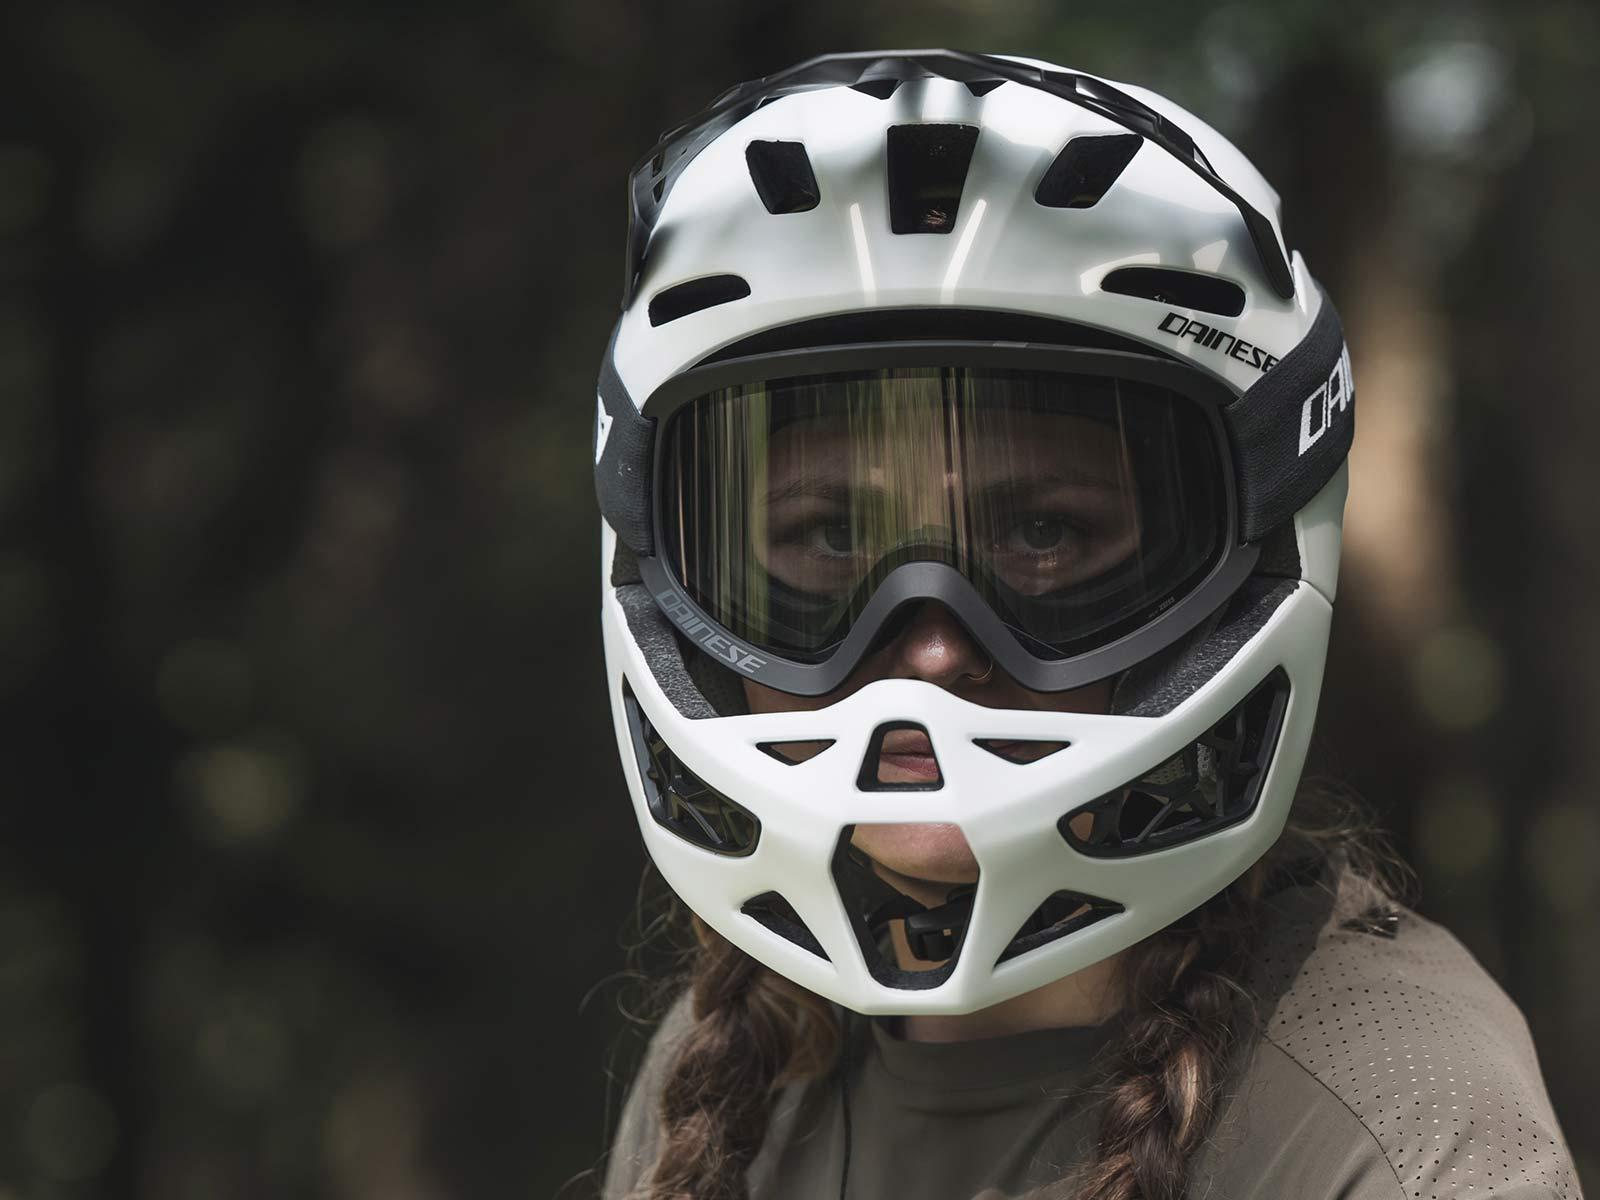 Dainese Linea 01 world's lightest full face helmet, lightweight MIPS DH MTB protection at 570g, Mountain Bike Connection rider Kasia Szlezak, photos by Rupert Fowler, front